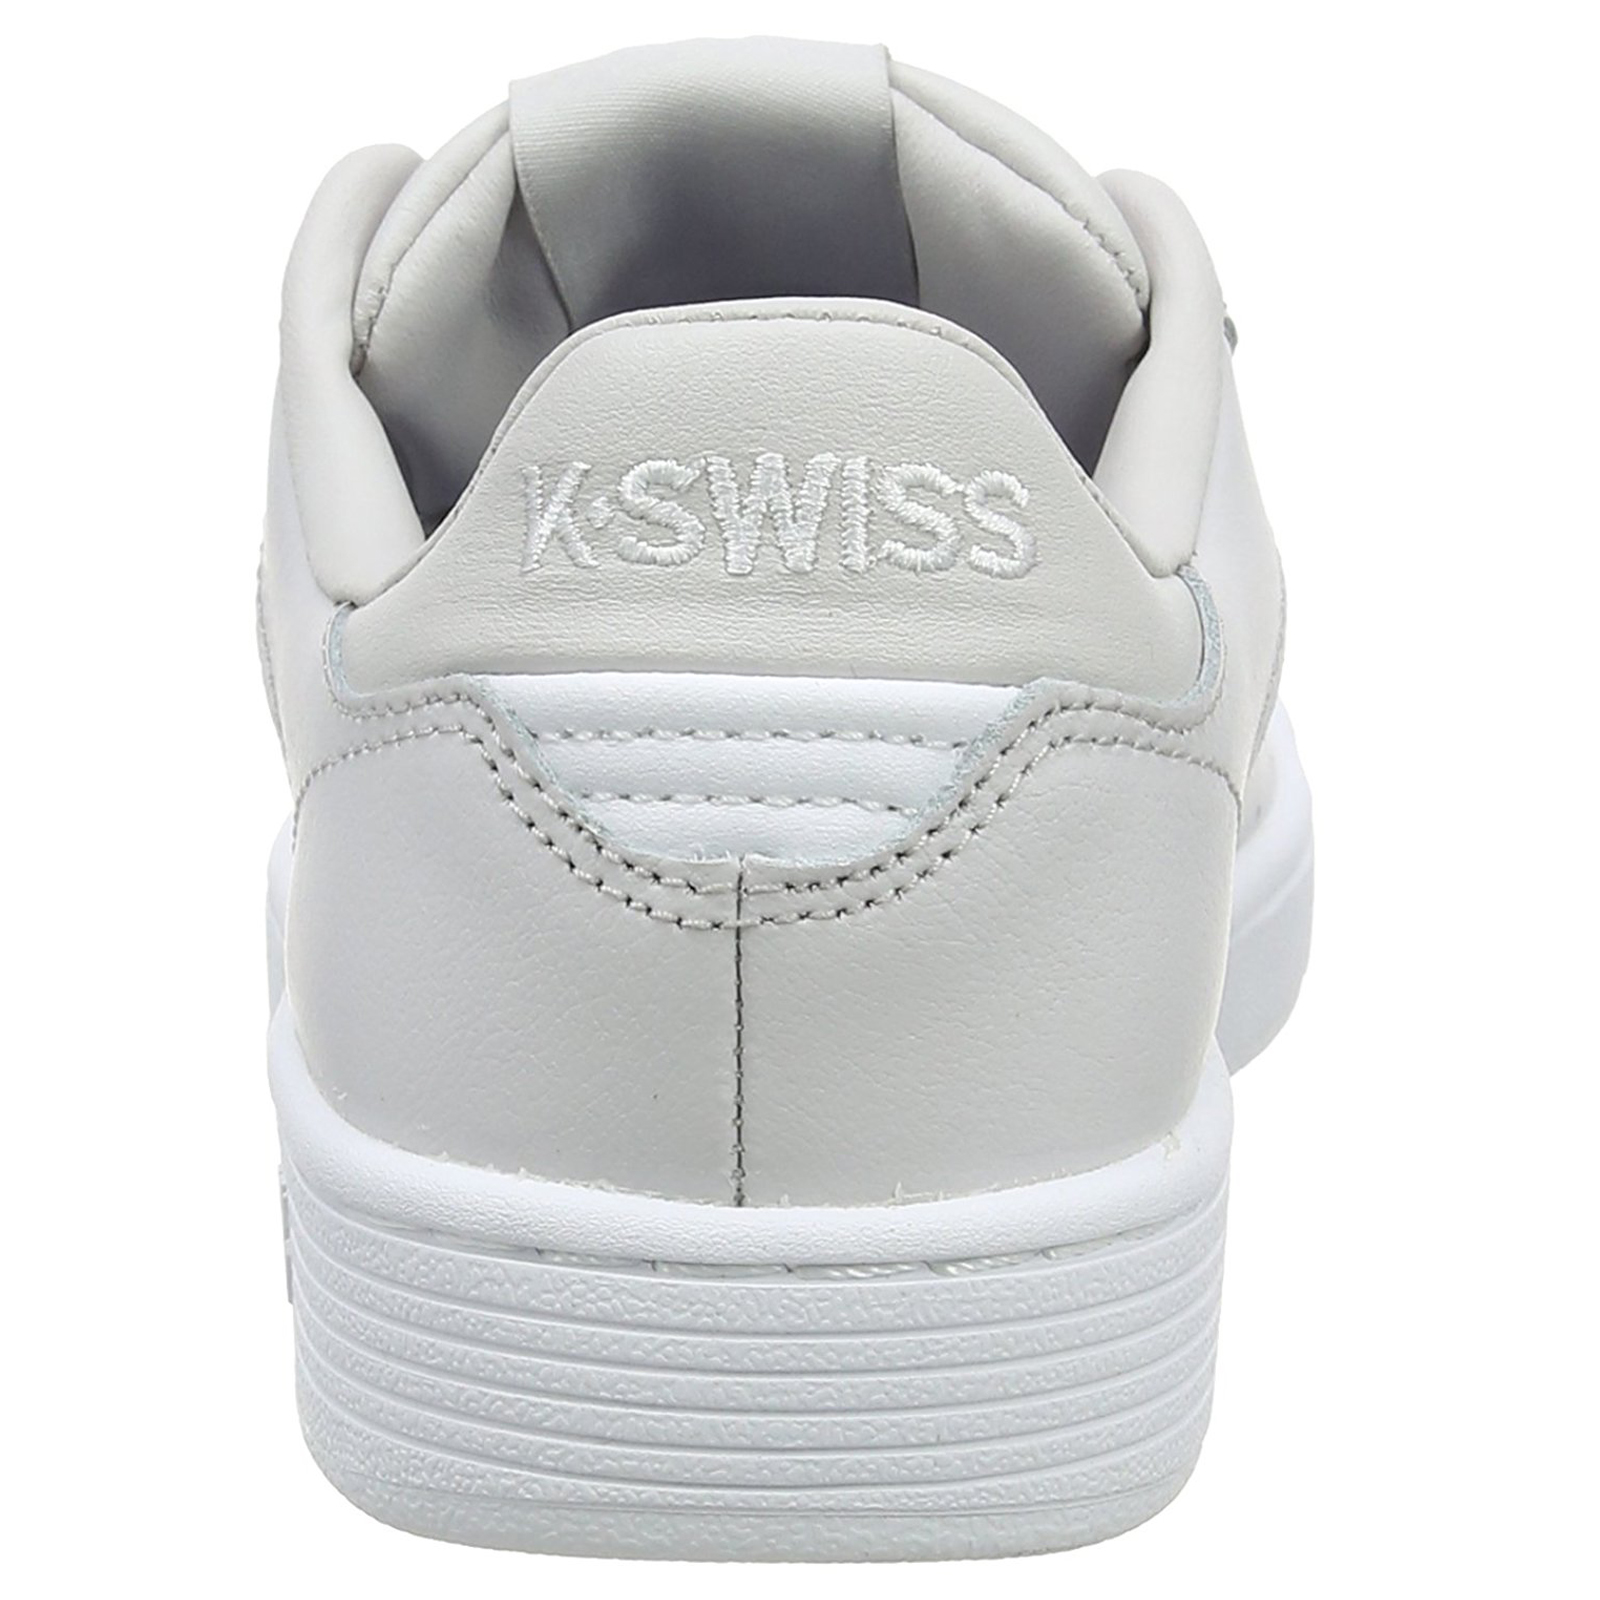 Chime Ladies Womens Designer Top Chime blanco K Blanco Trainers Wind swiss Court Low Clean qZwR4xv7Ra